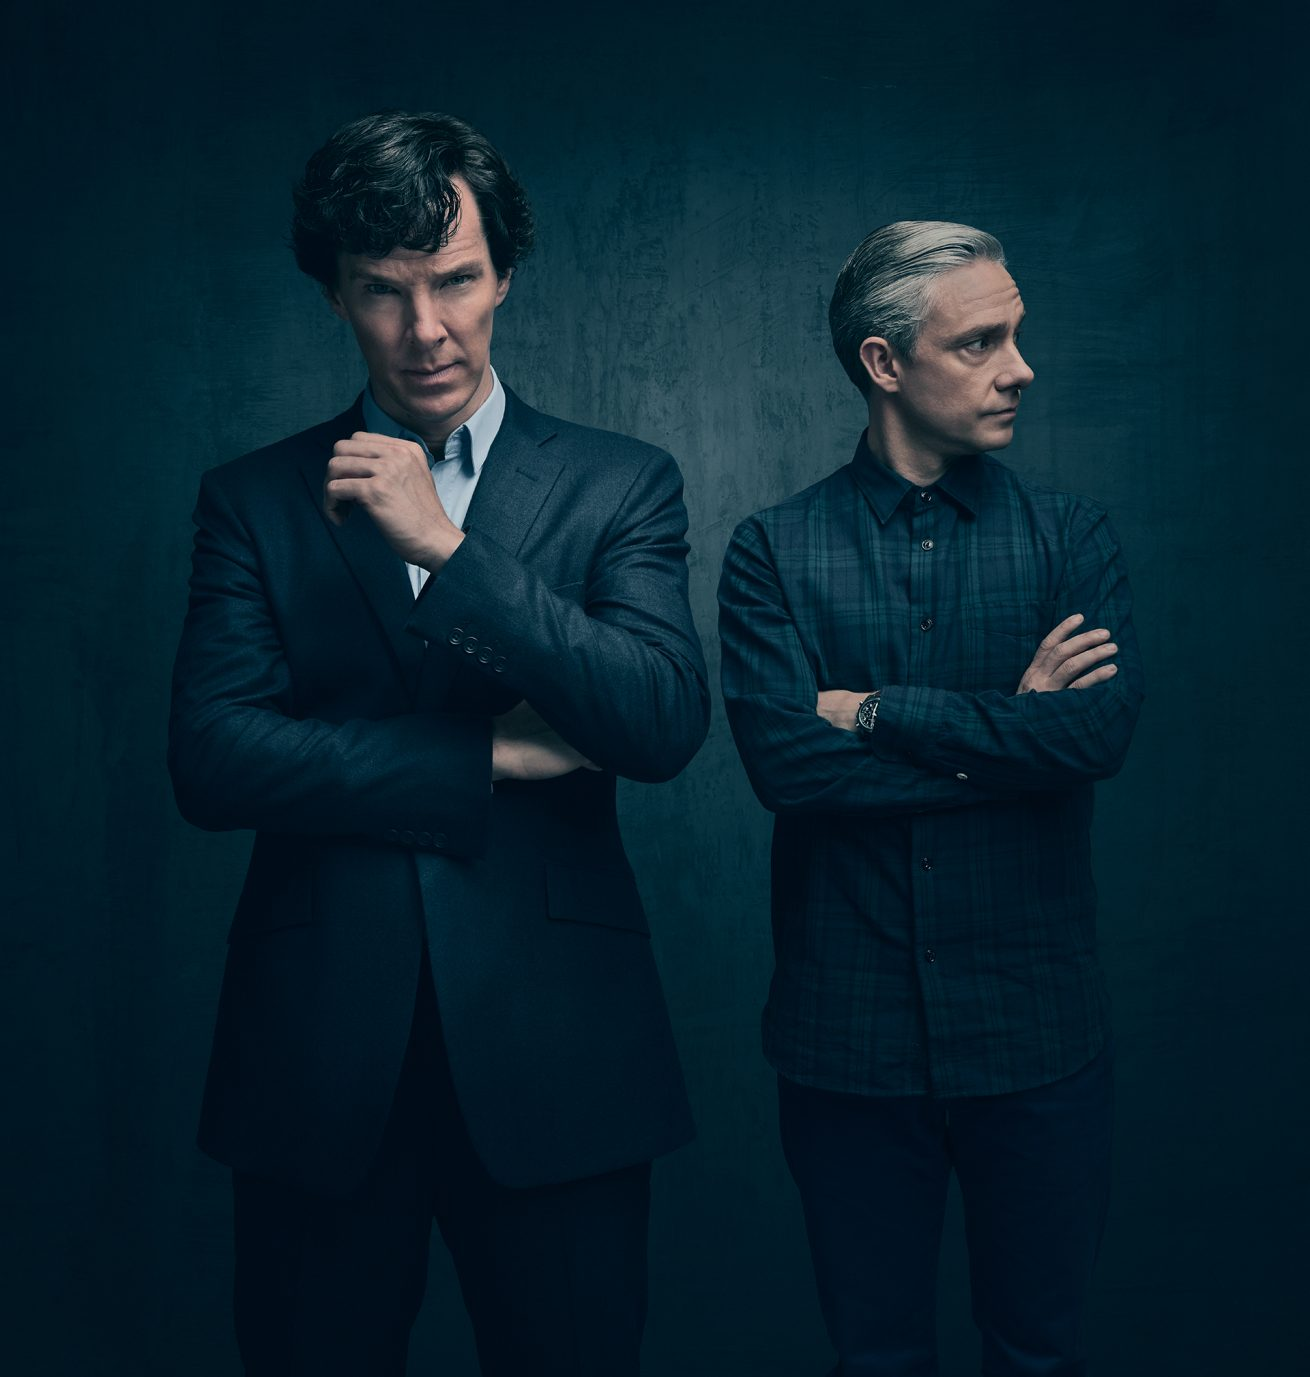 Sherlock S4 - Teaser Portrait